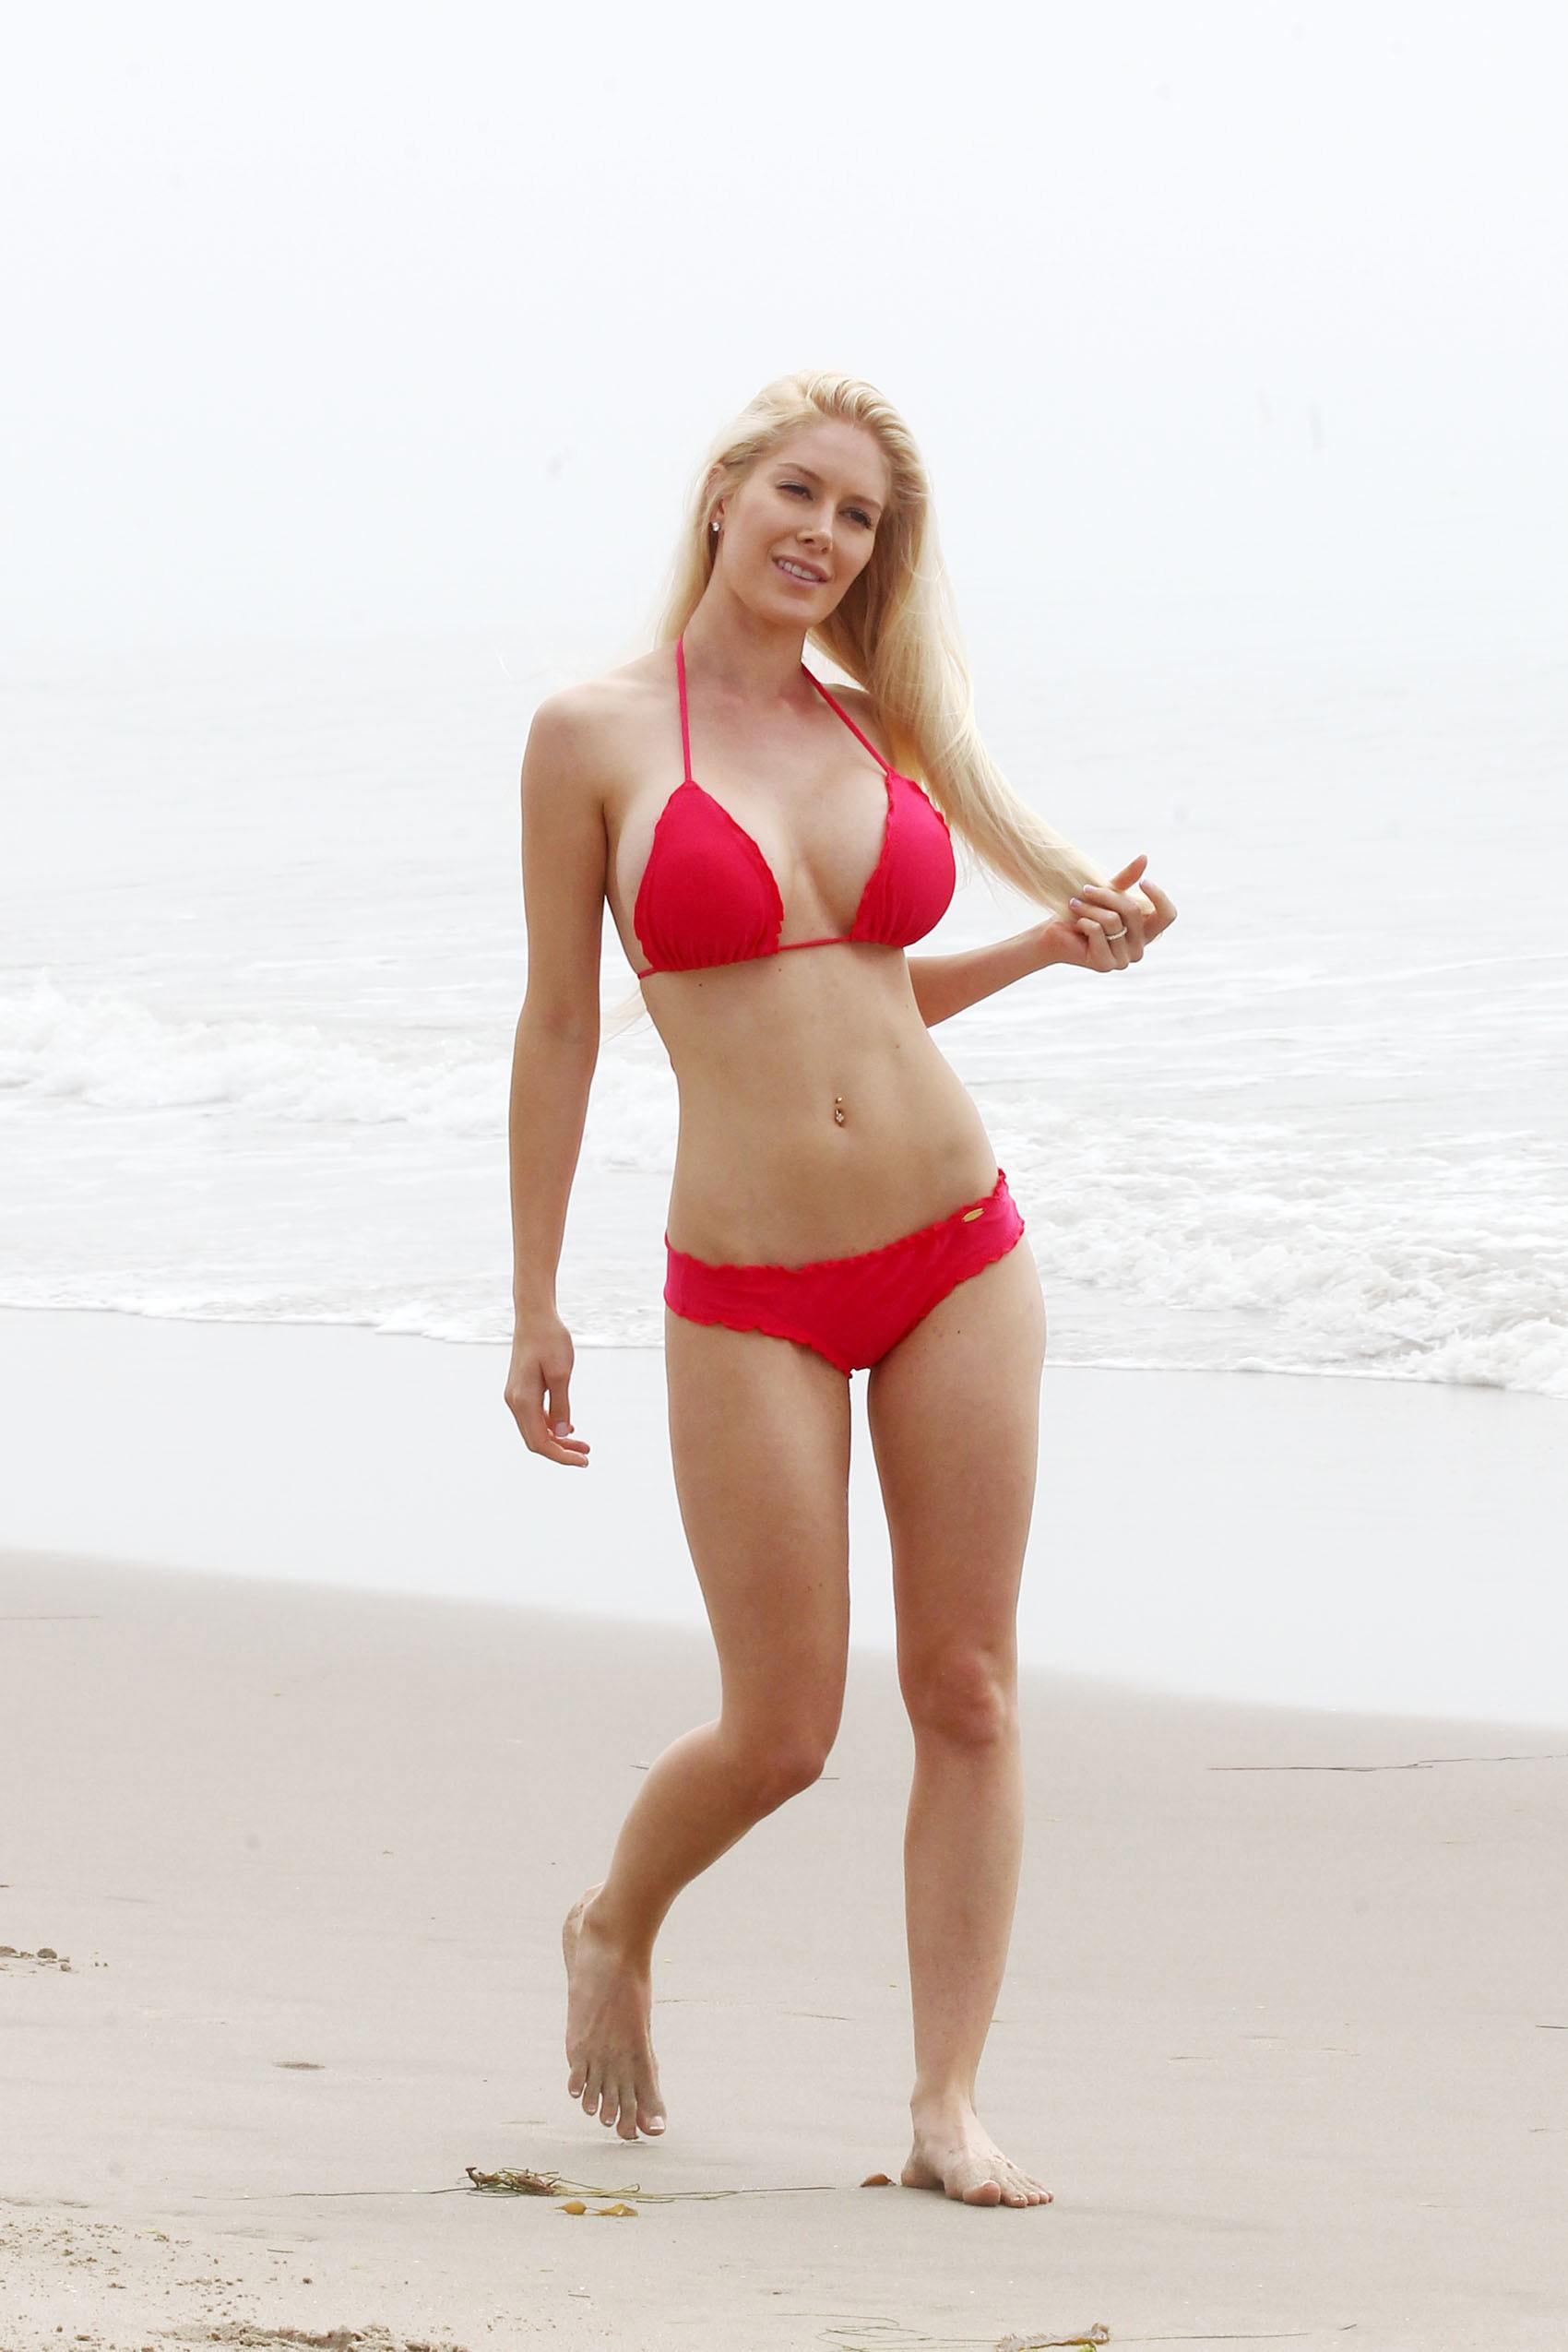 Heidi Montag Spends some time on the beach in Santa Monica (November 8, 2012)  (bikini)